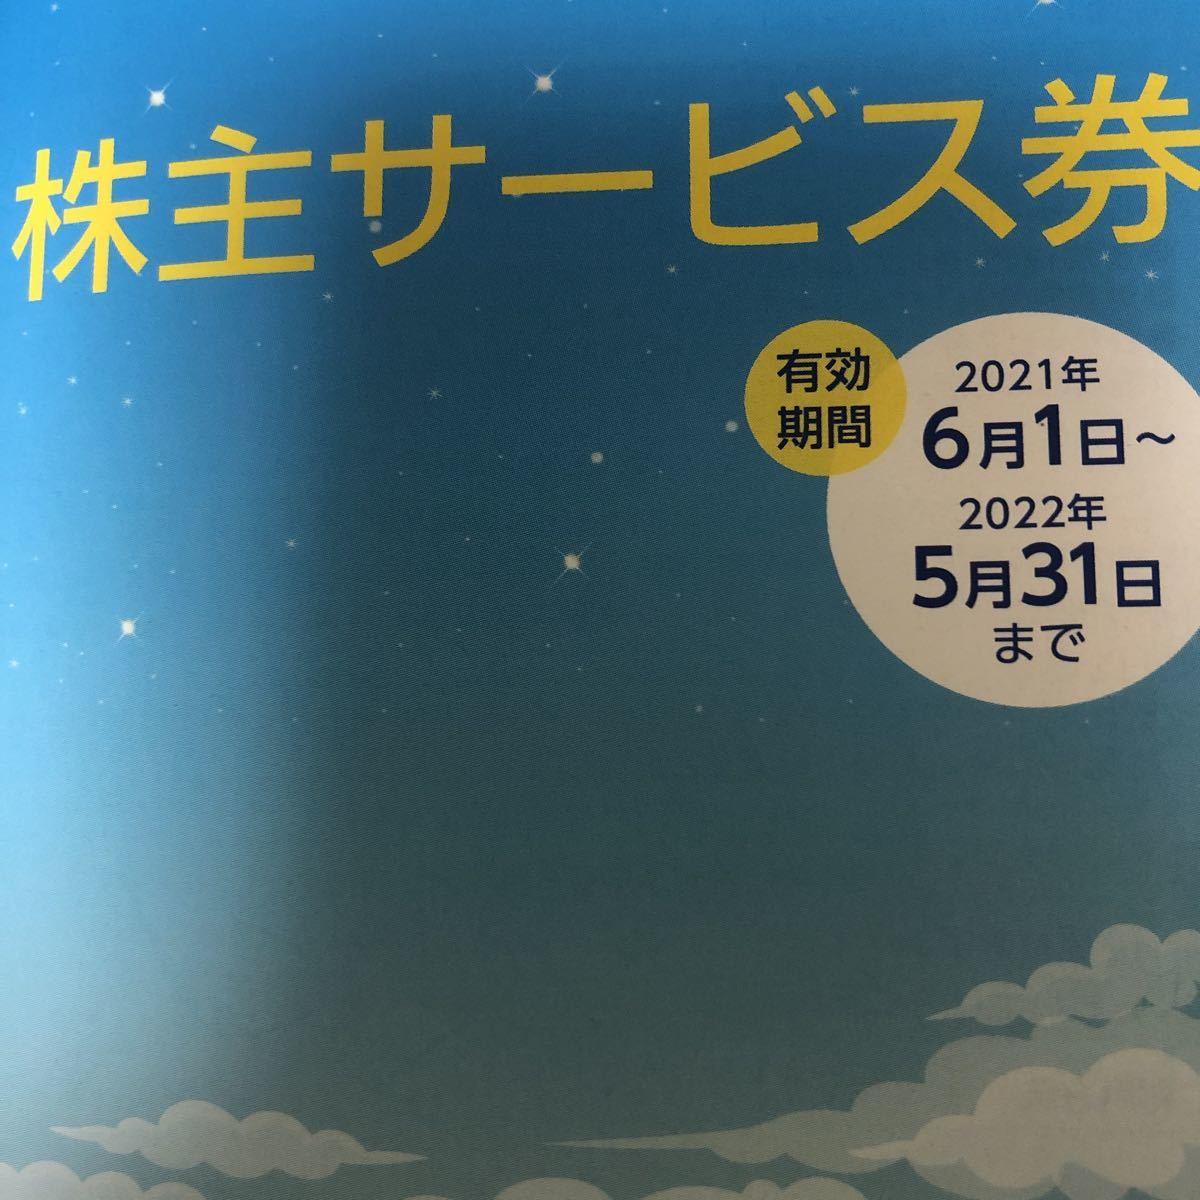 JR東日本 株主優待 宿泊券美術館ステーションギャラリー入館割引券ホテルメトロポリタンMETSメッツファミリーオフォルクローロ2枚ずつ_画像3